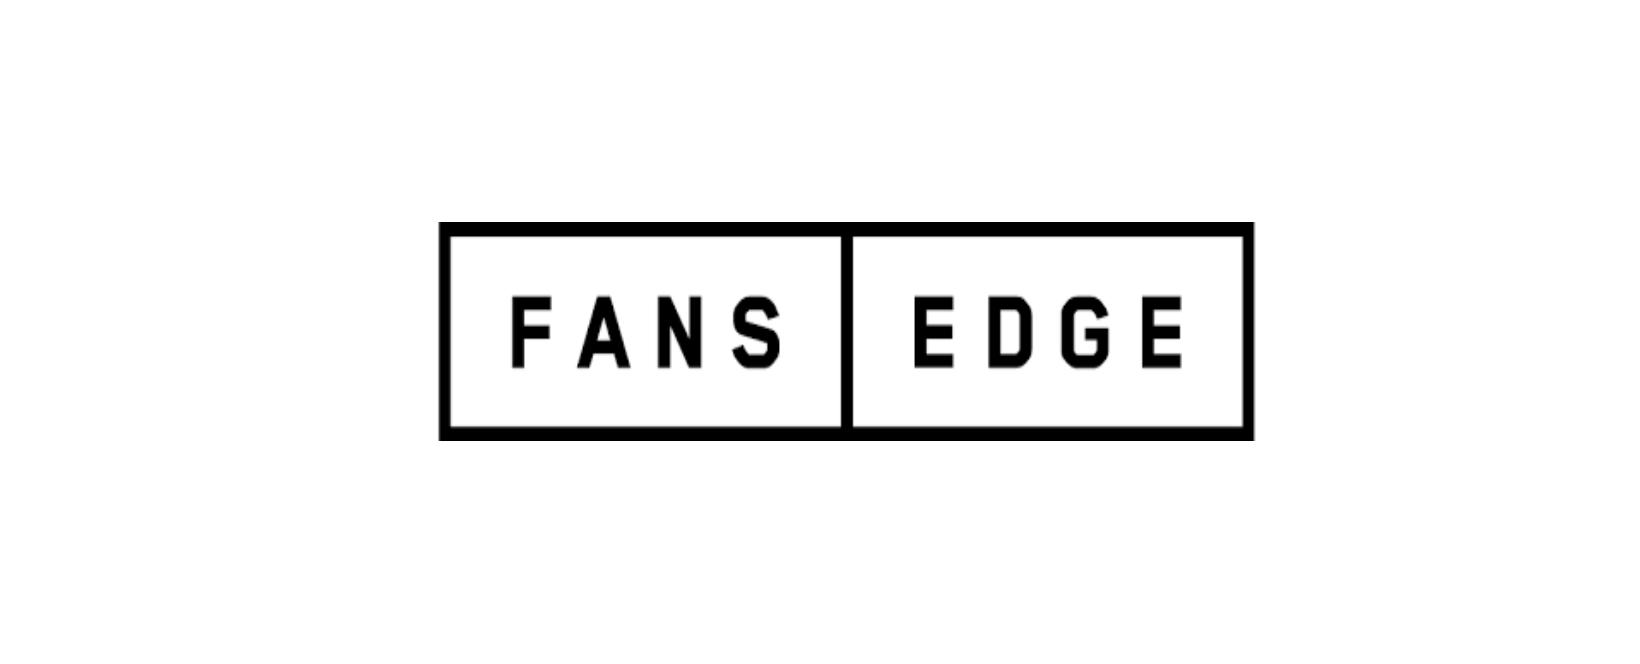 FansEdge Discount Code 2021